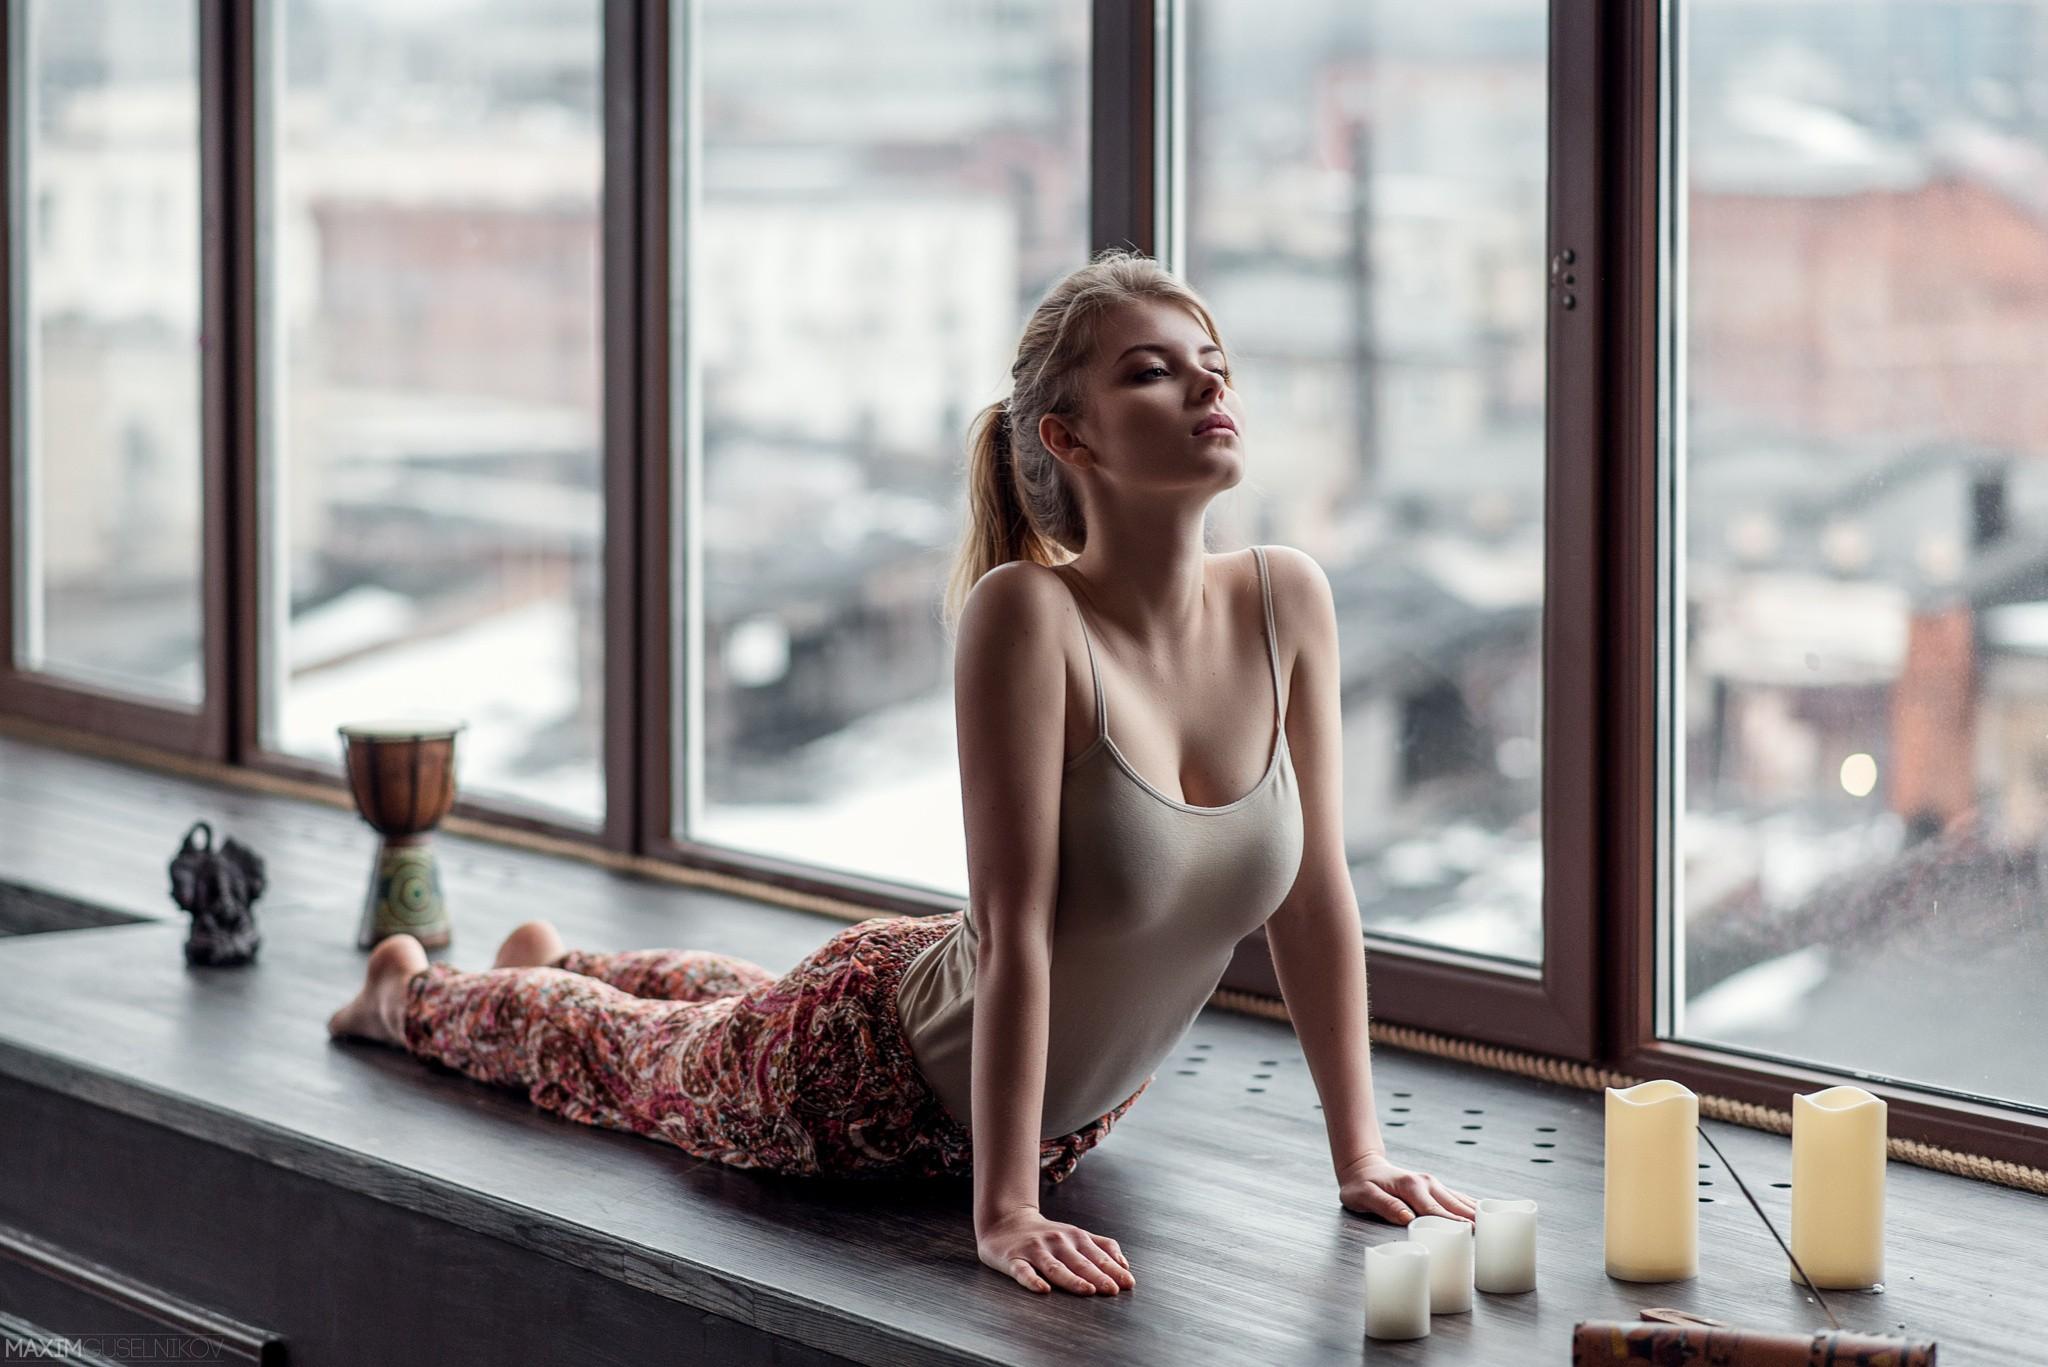 People 2048x1367 Maxim Guselnikov women blonde ponytail big boobs tank top yoga Irina Popova stretching